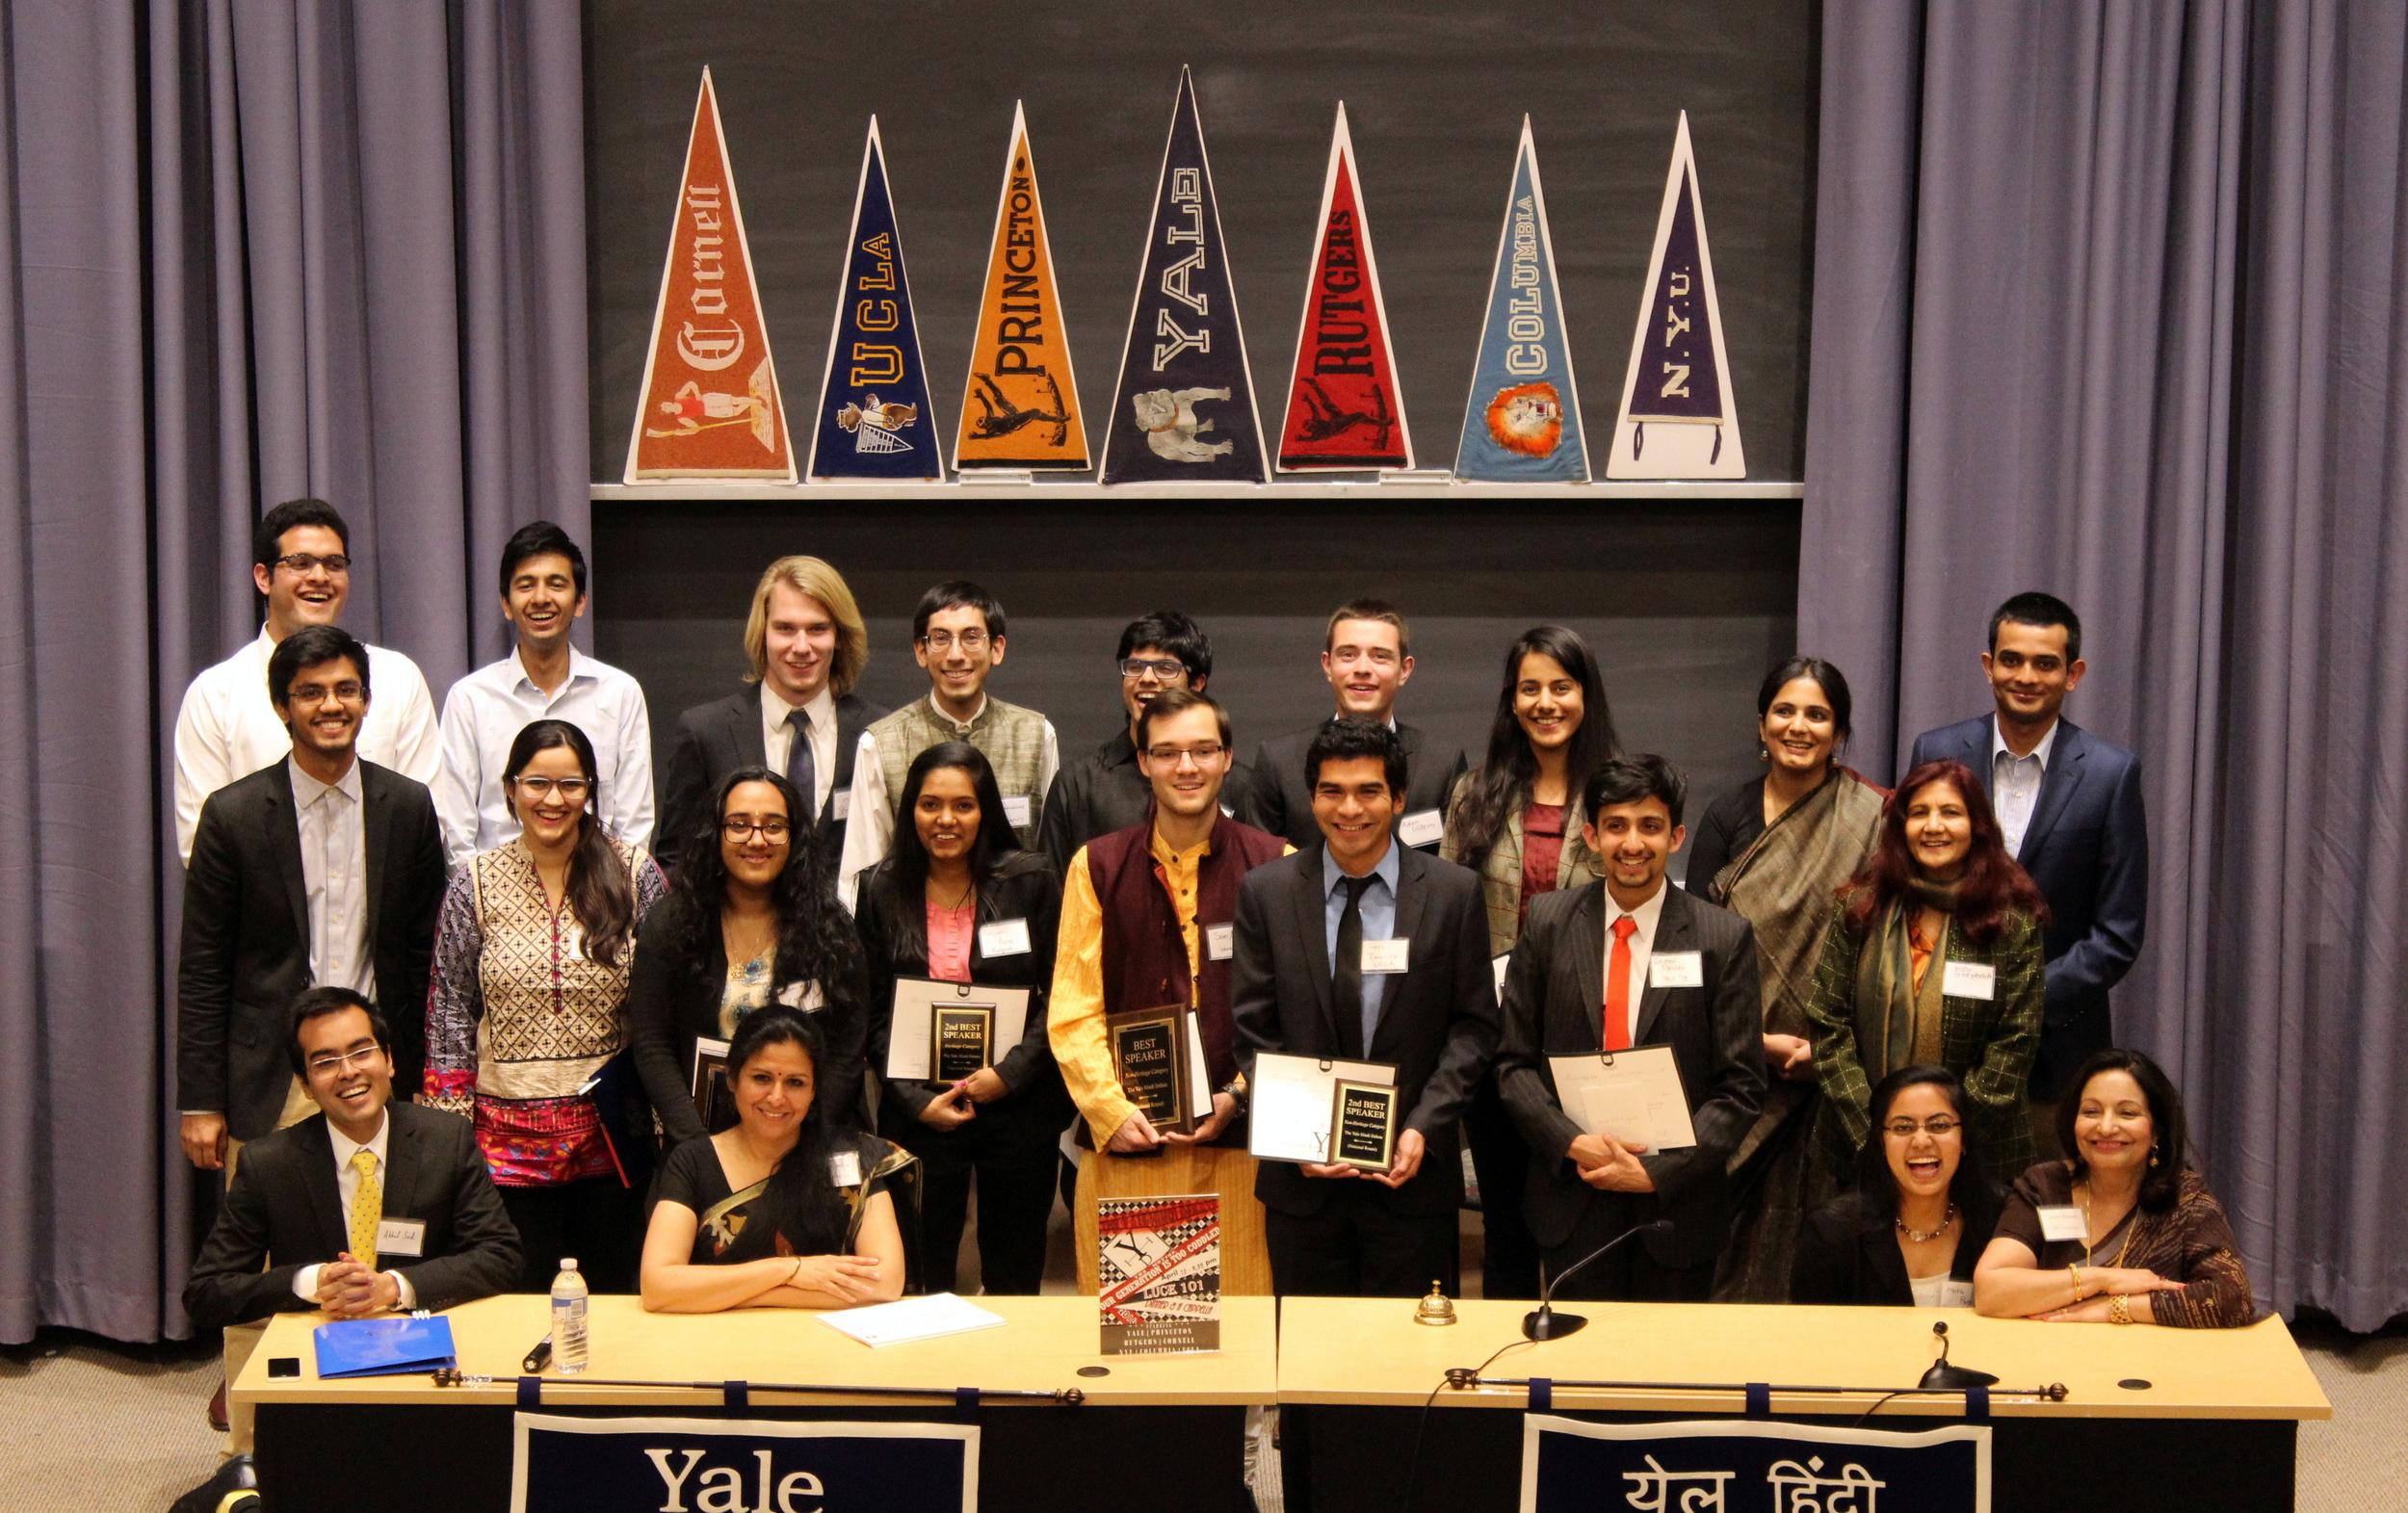 Photography at event by Bibek, Gaurav, and Priyankar, Yale University